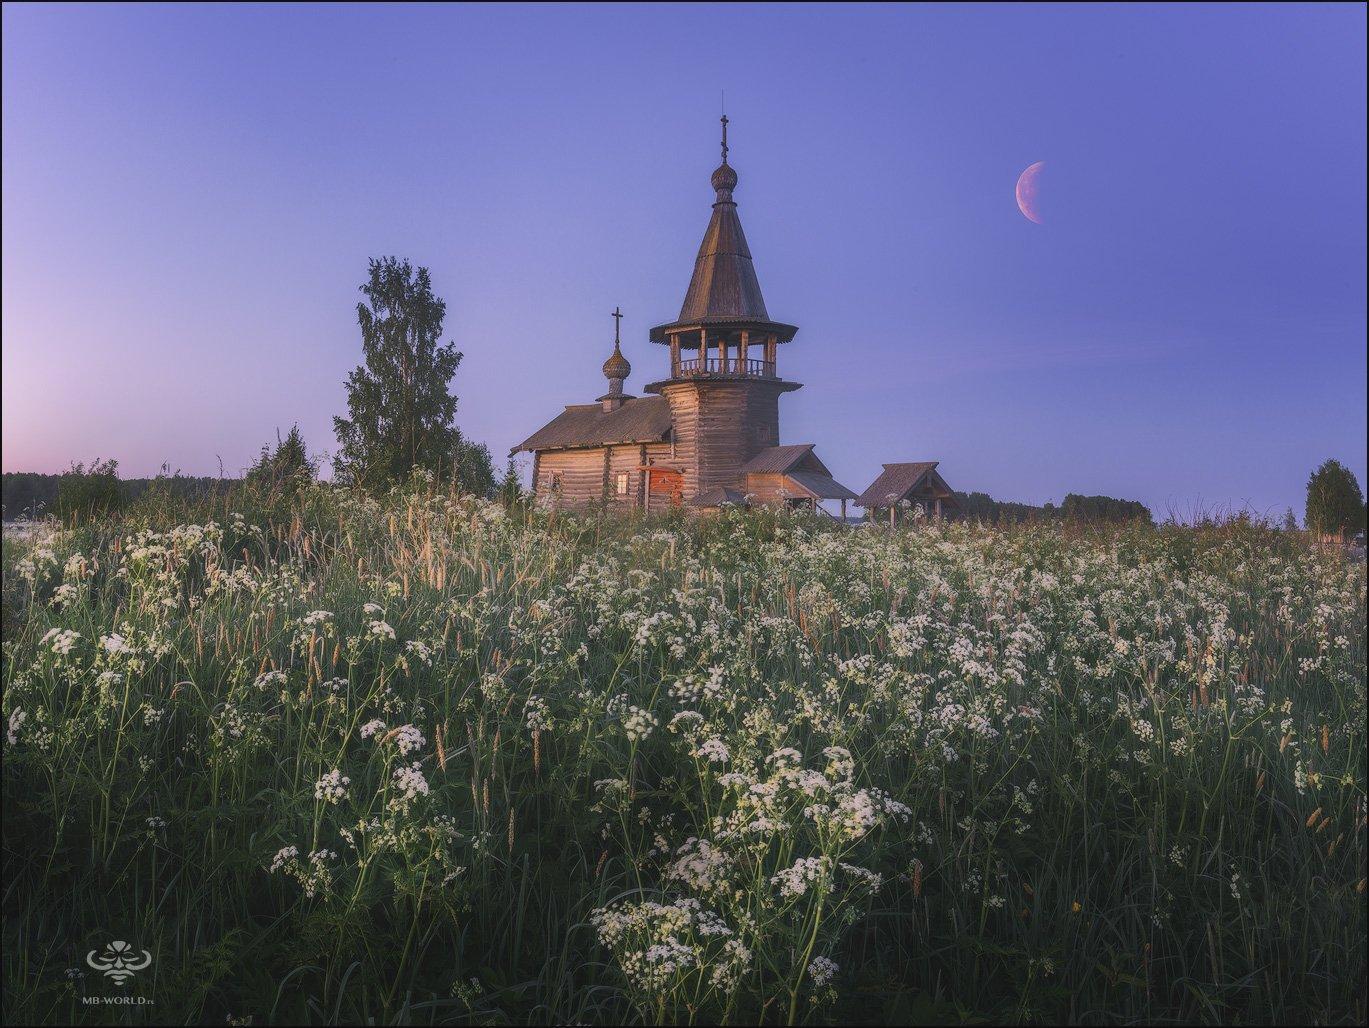 Россия, Карелия, пейзаж, фототуры, фото путешествия , Mikhail Vorobyev